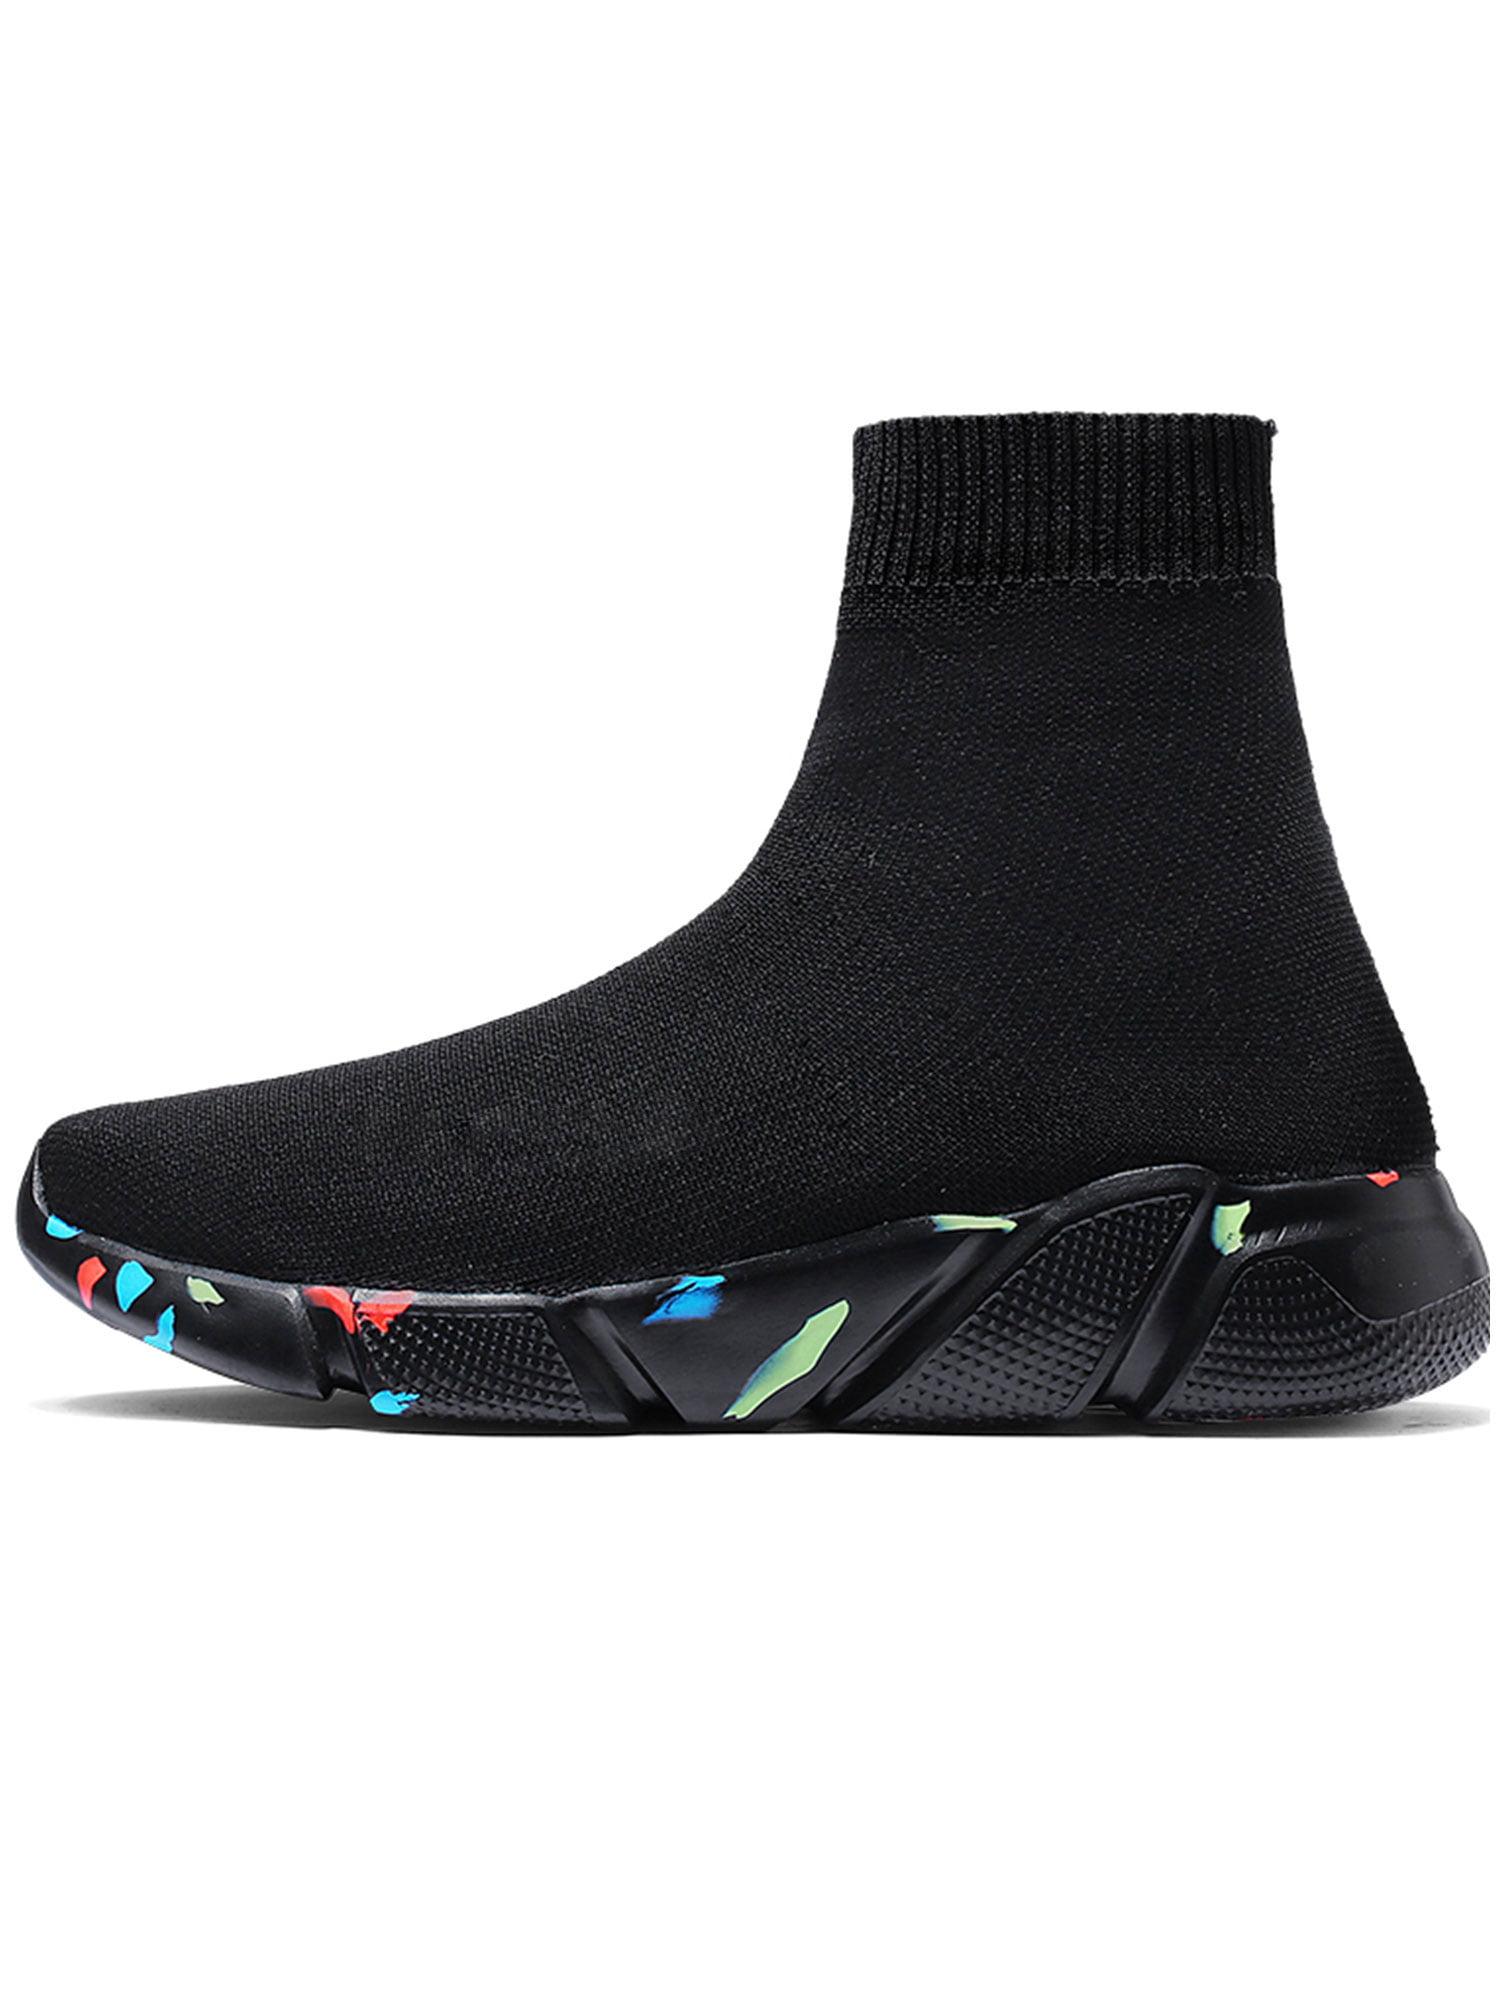 Tanleewa - Women Sock Shoes High Top